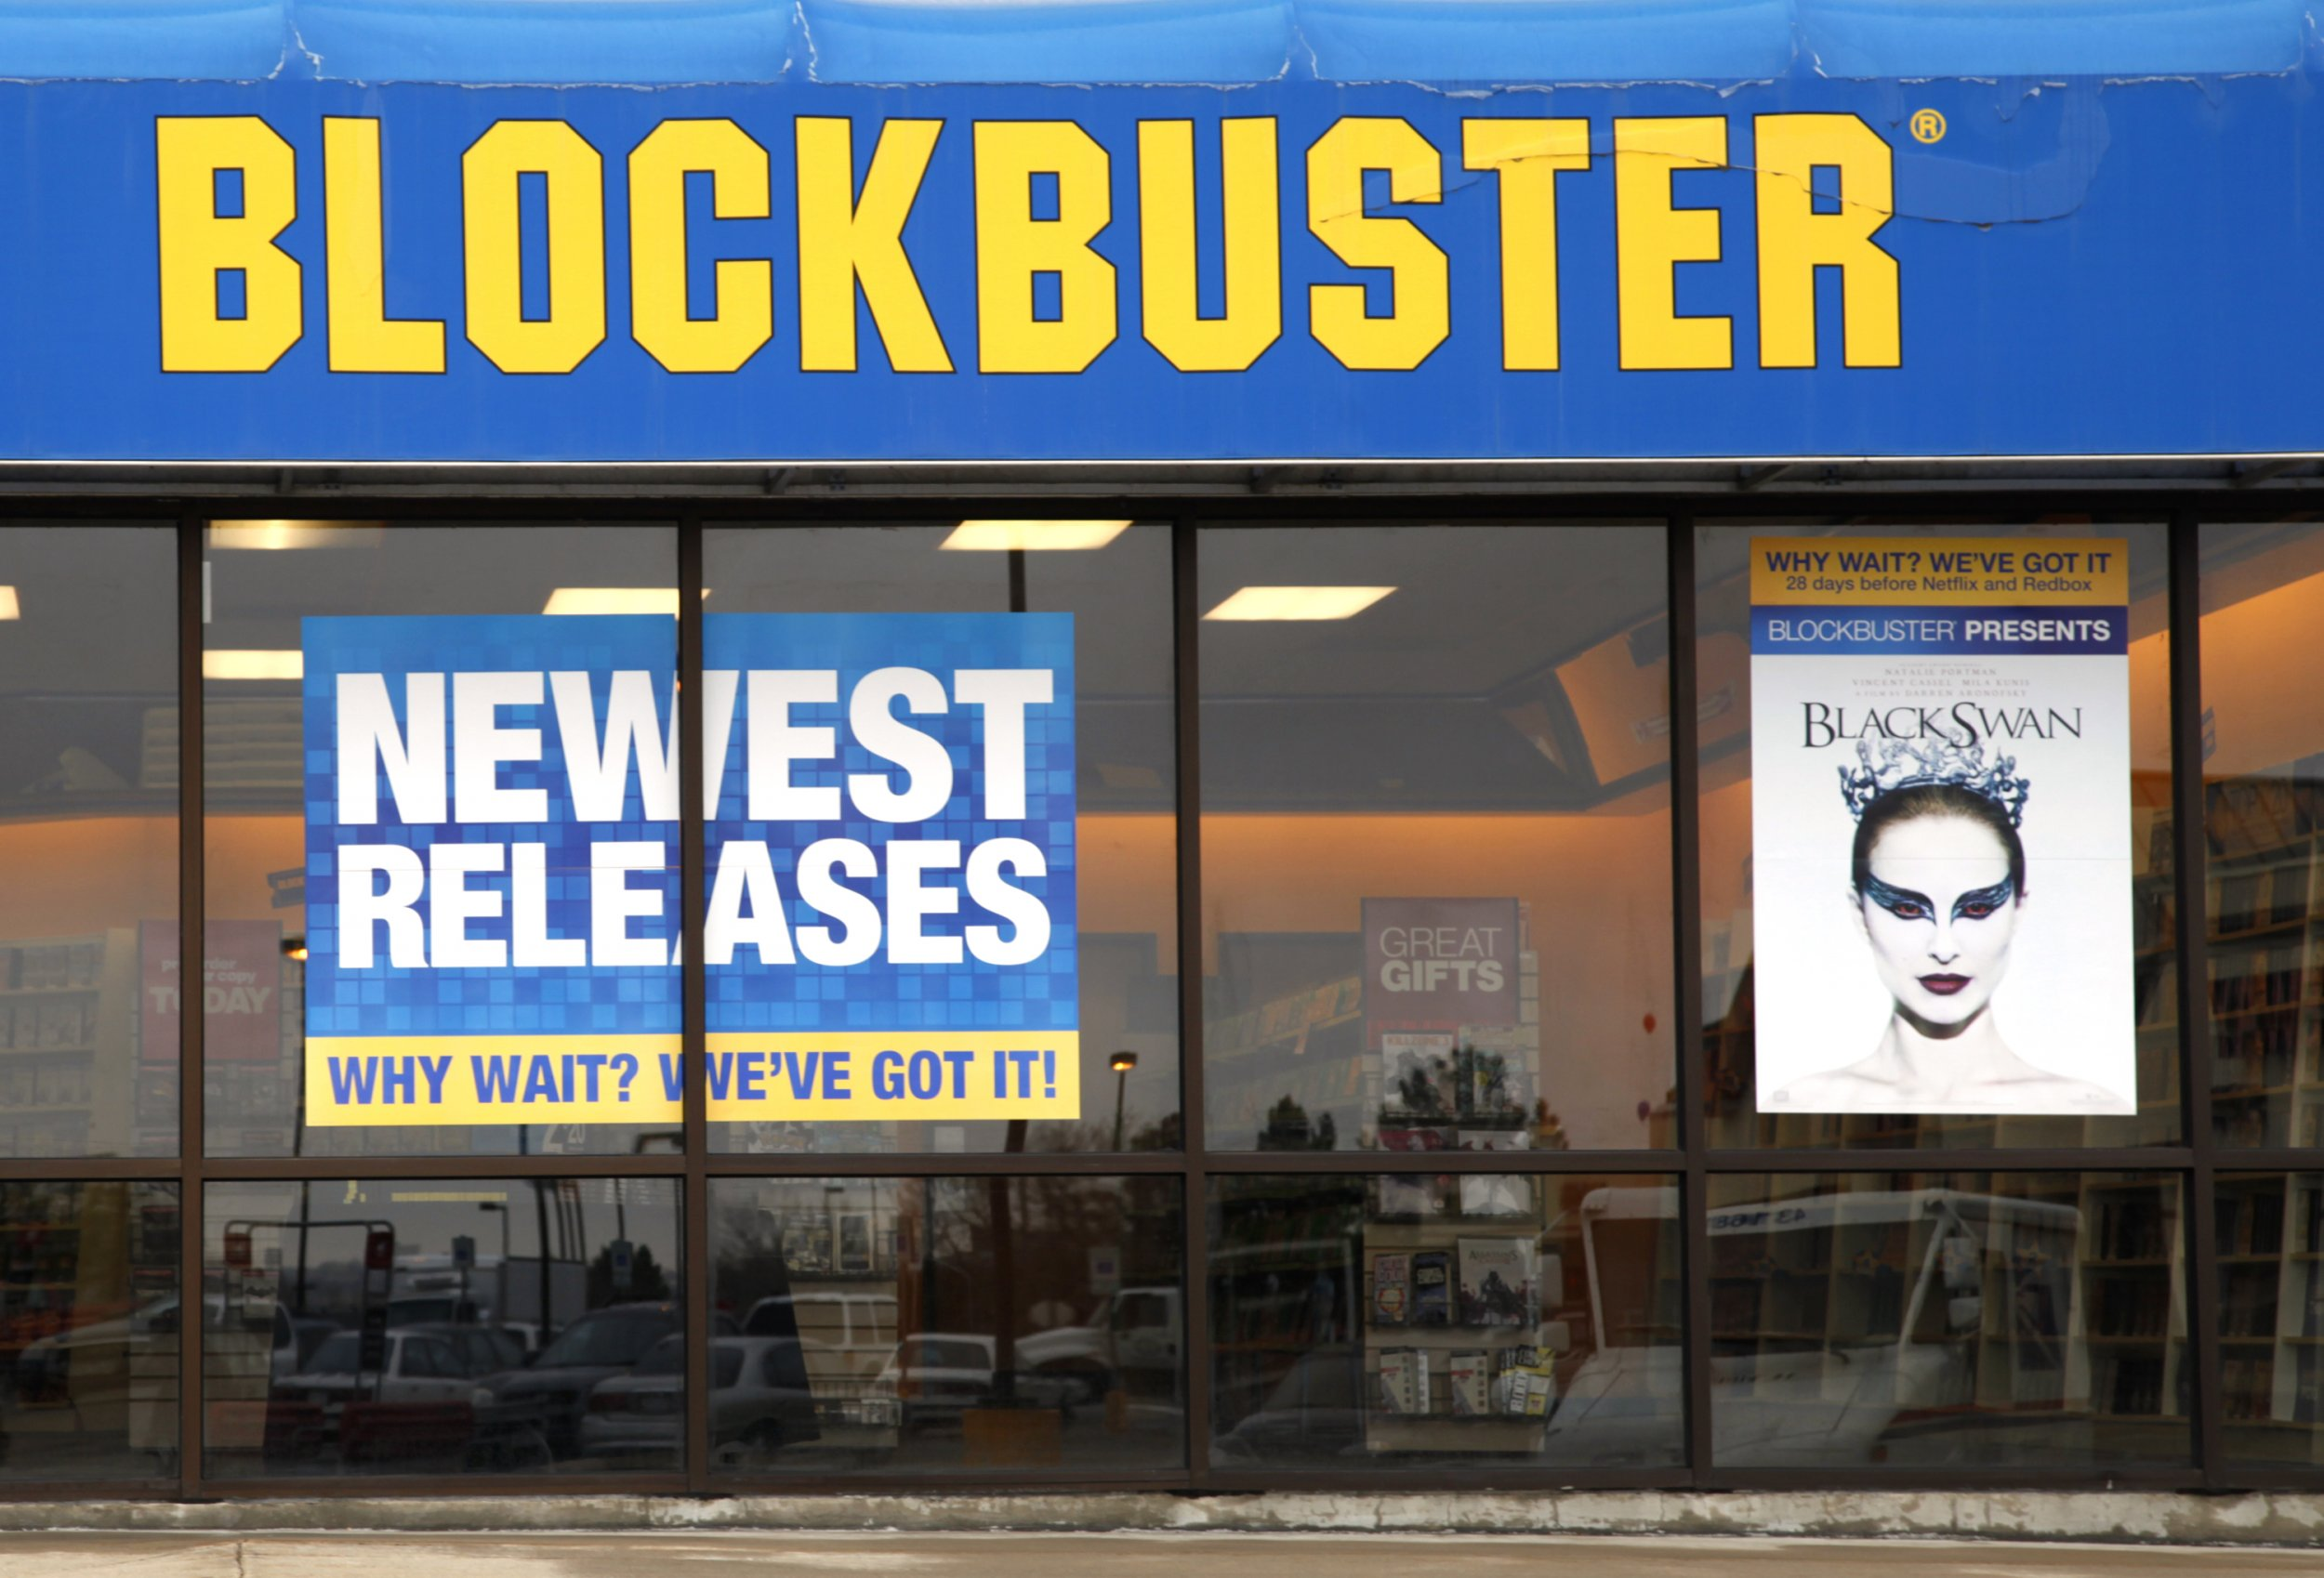 Blockbuster Video Company